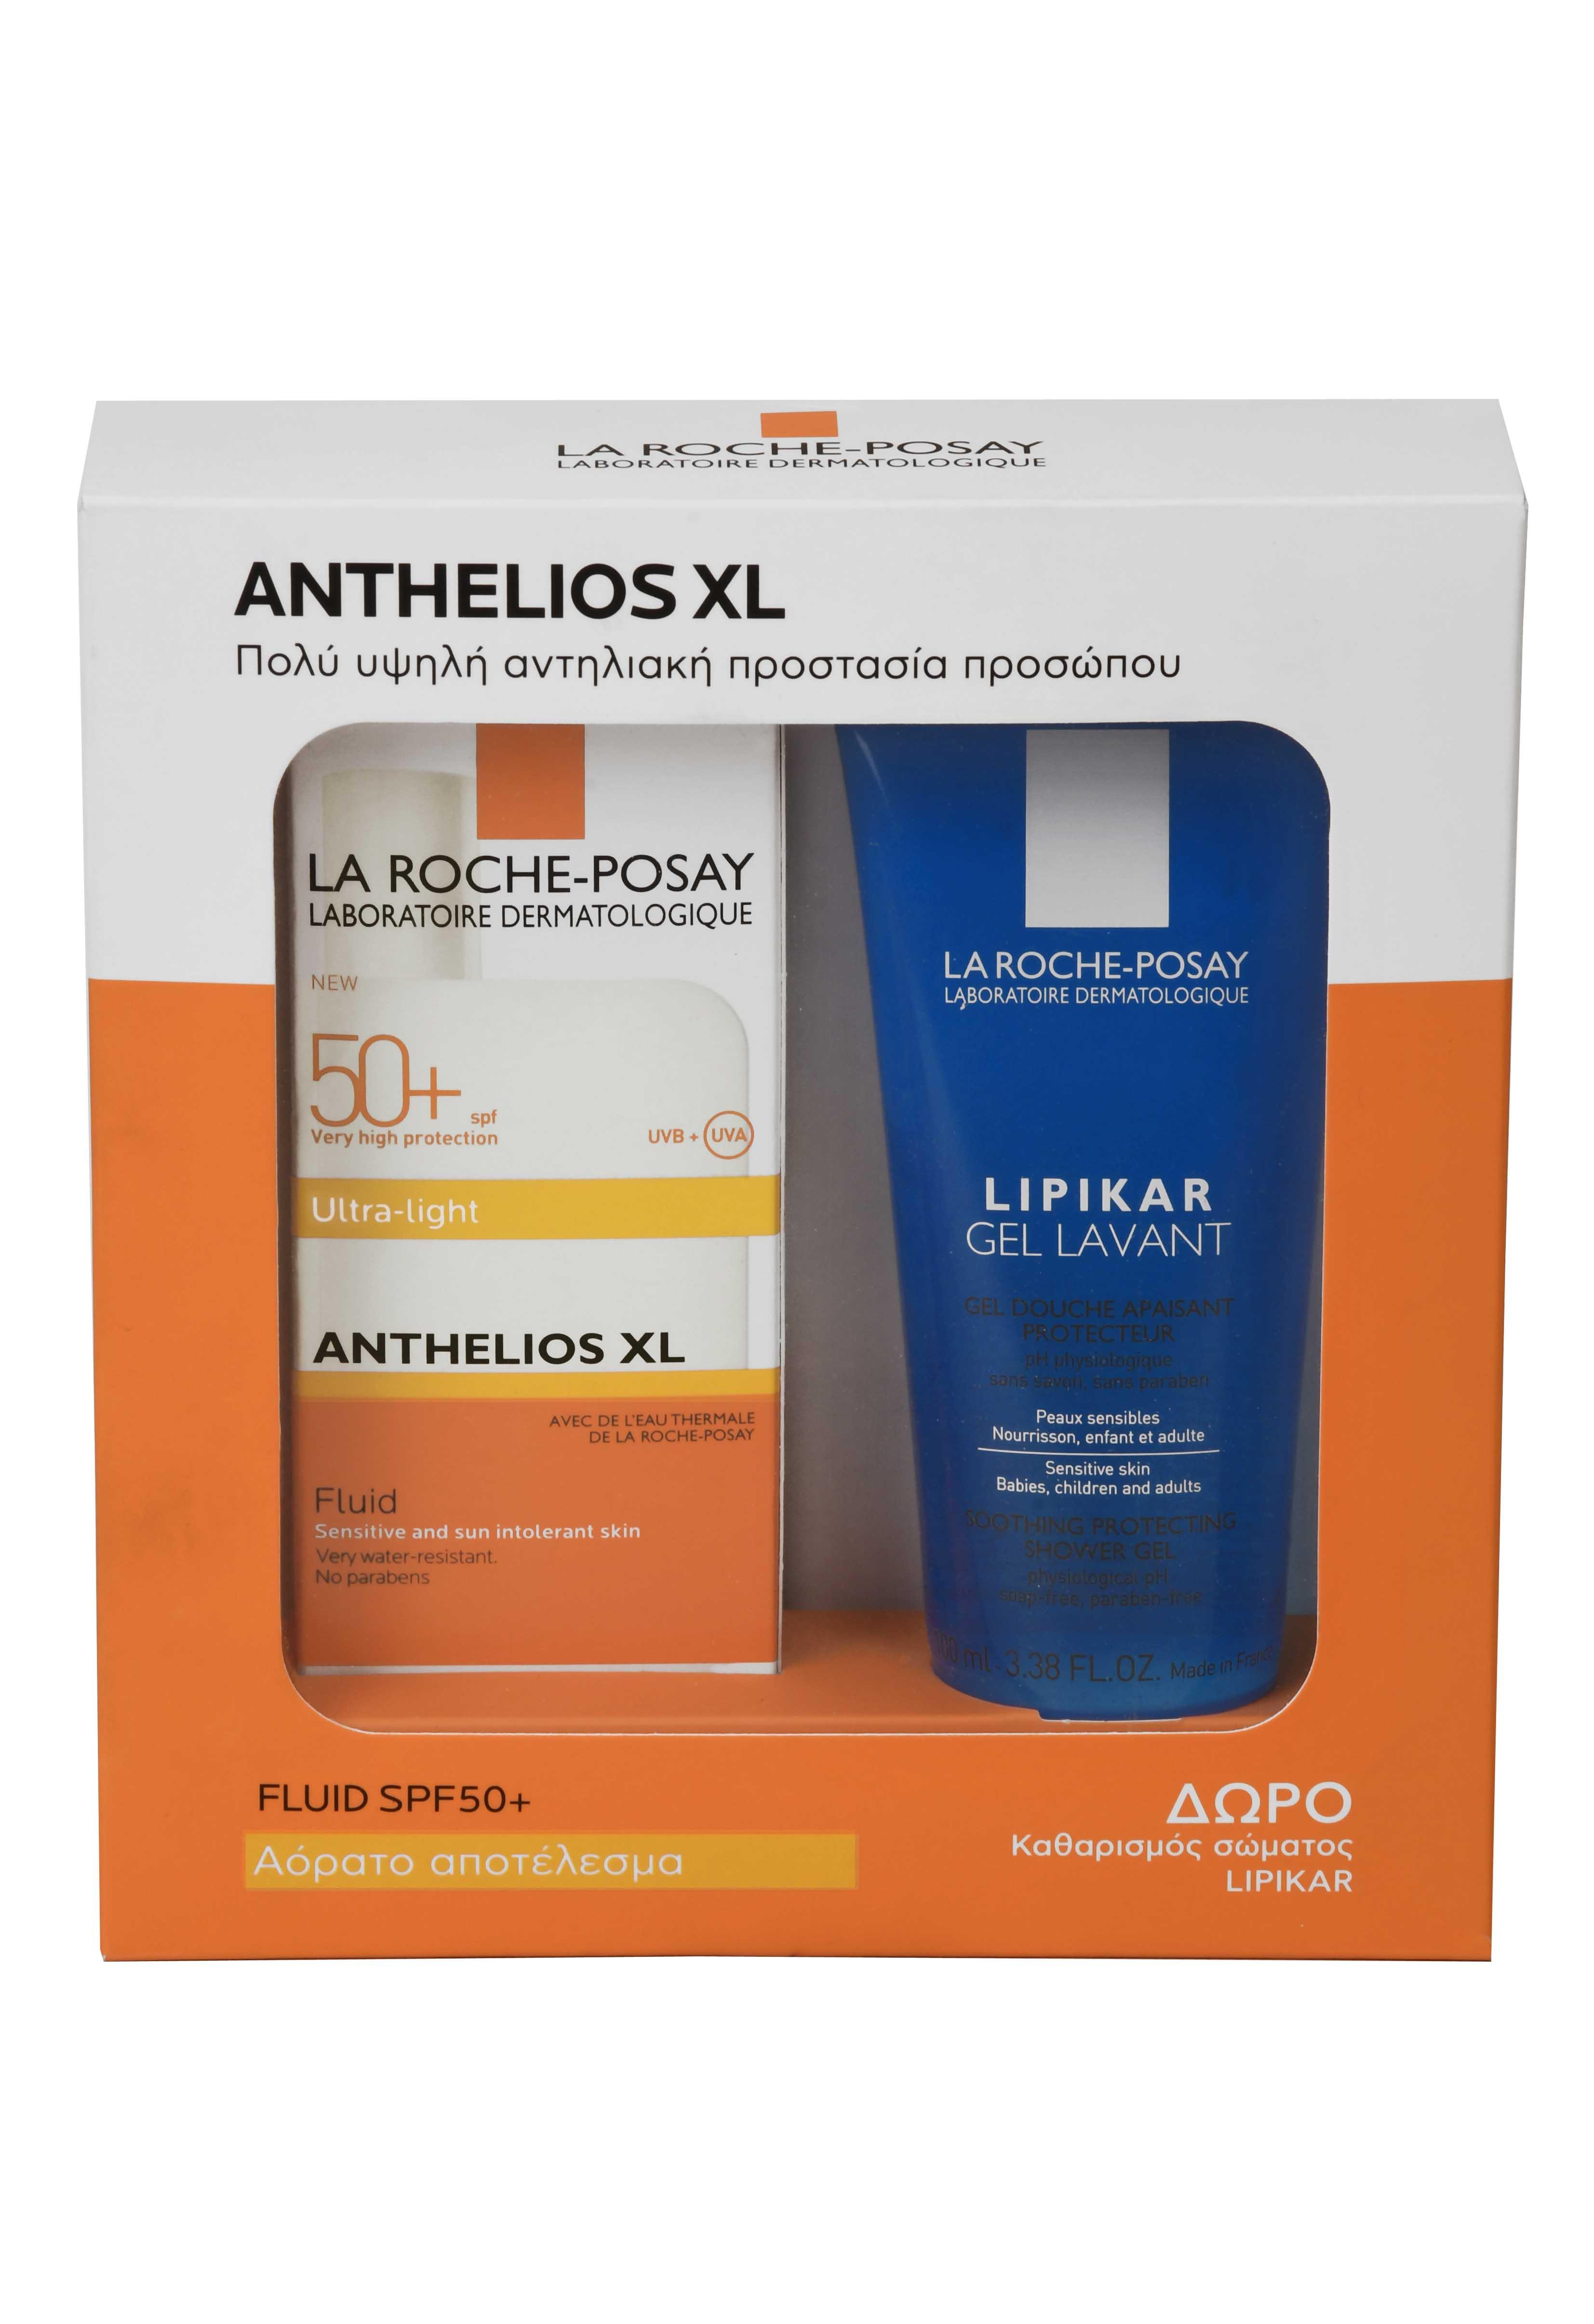 La Roche Posay Anthelios XL Fluide SPF 50+ Λεπτόρρευστη Αντηλιακή Κρέμα Προσώπου με Άρωμα, 50ml & ΔΩΡΟ Lipikar Gel Lavant Απαλός Καθαρισμός Σώματος, 100ml